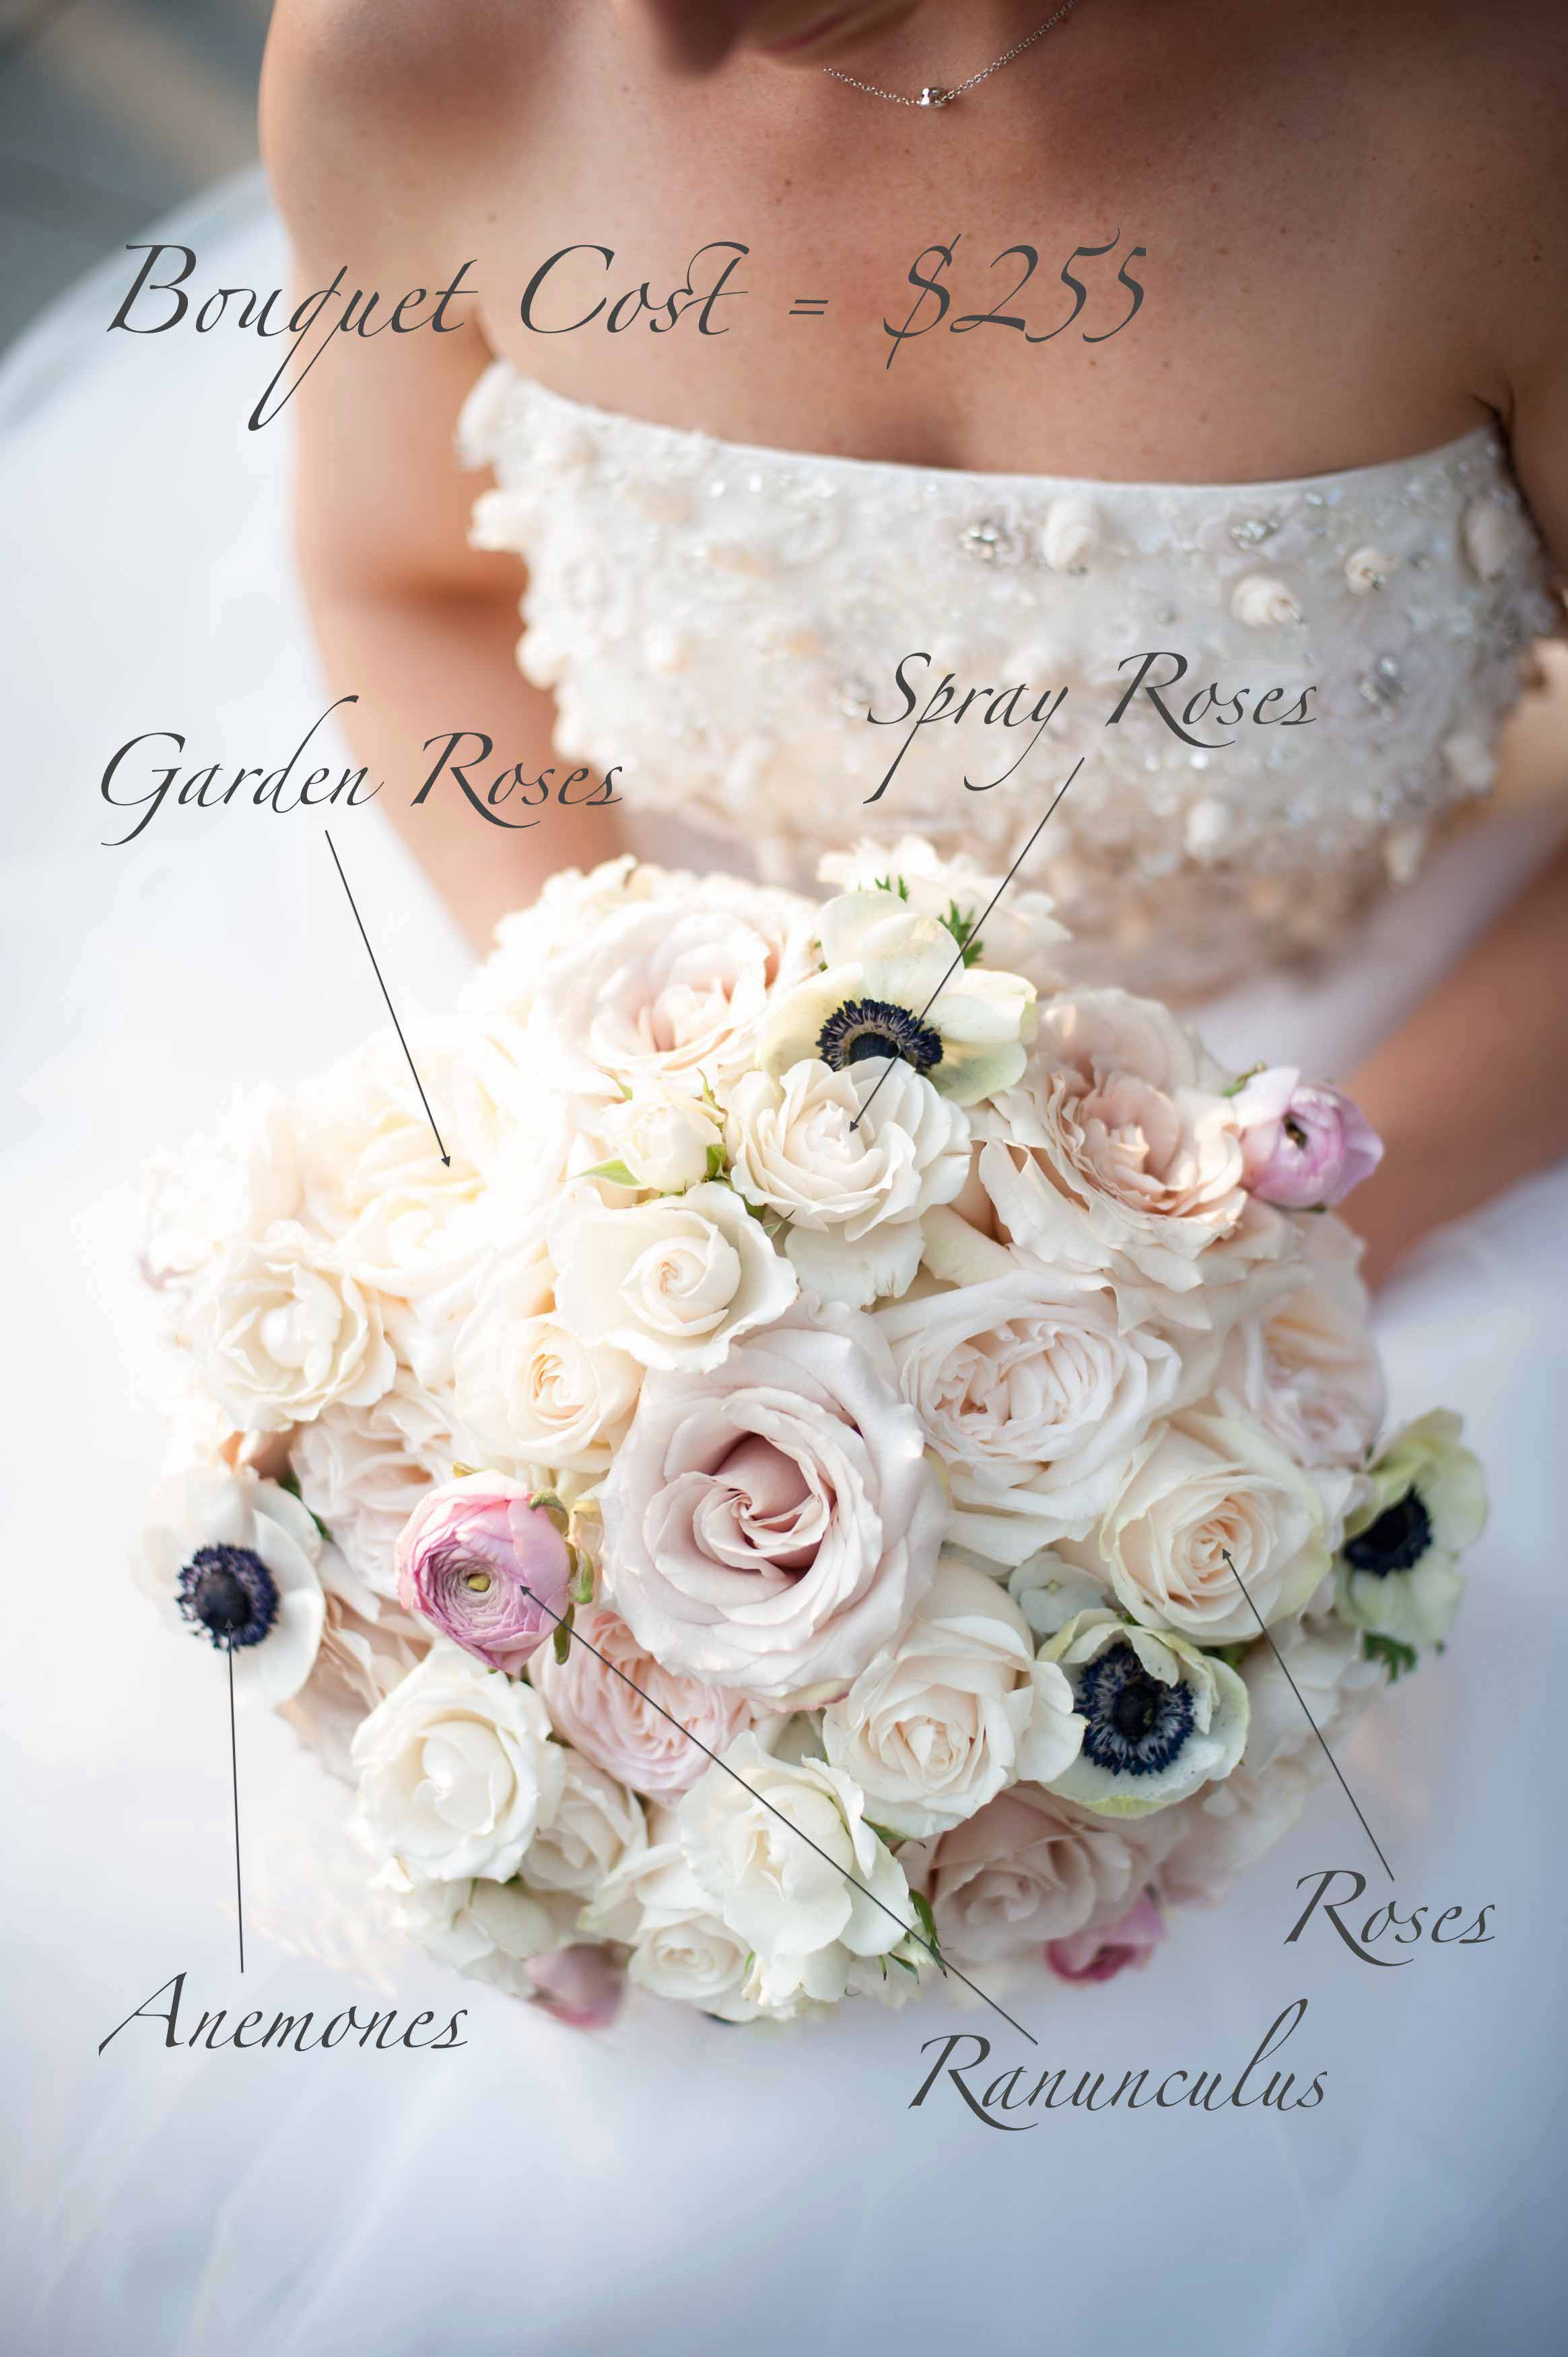 White and blush bouquet recipe - Bridal Bouquet Pricing - Flora Nova Design Seattle